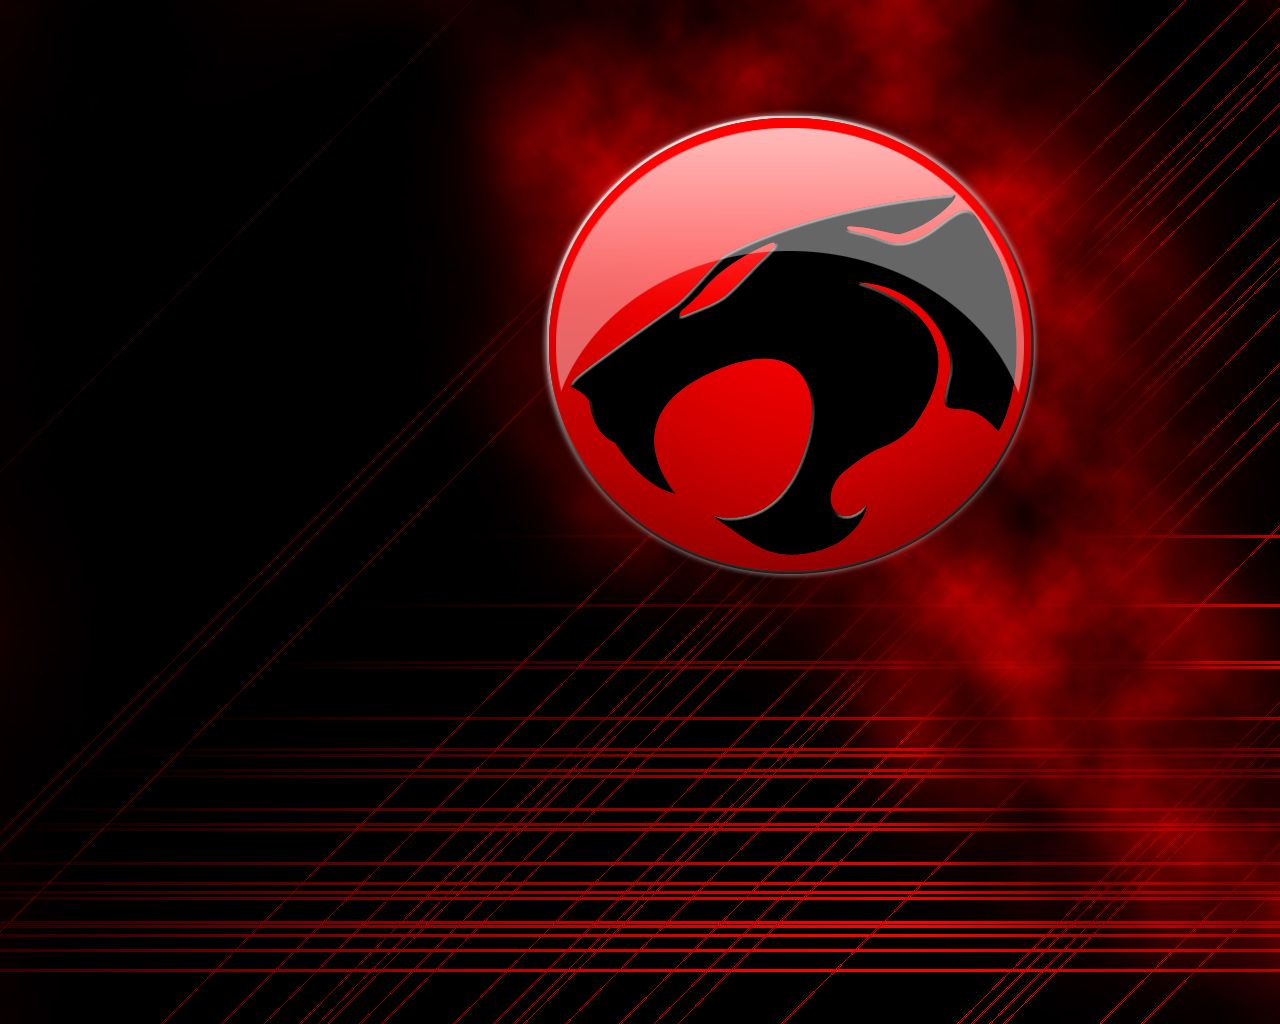 Red Logo Thundercats Wallpaper